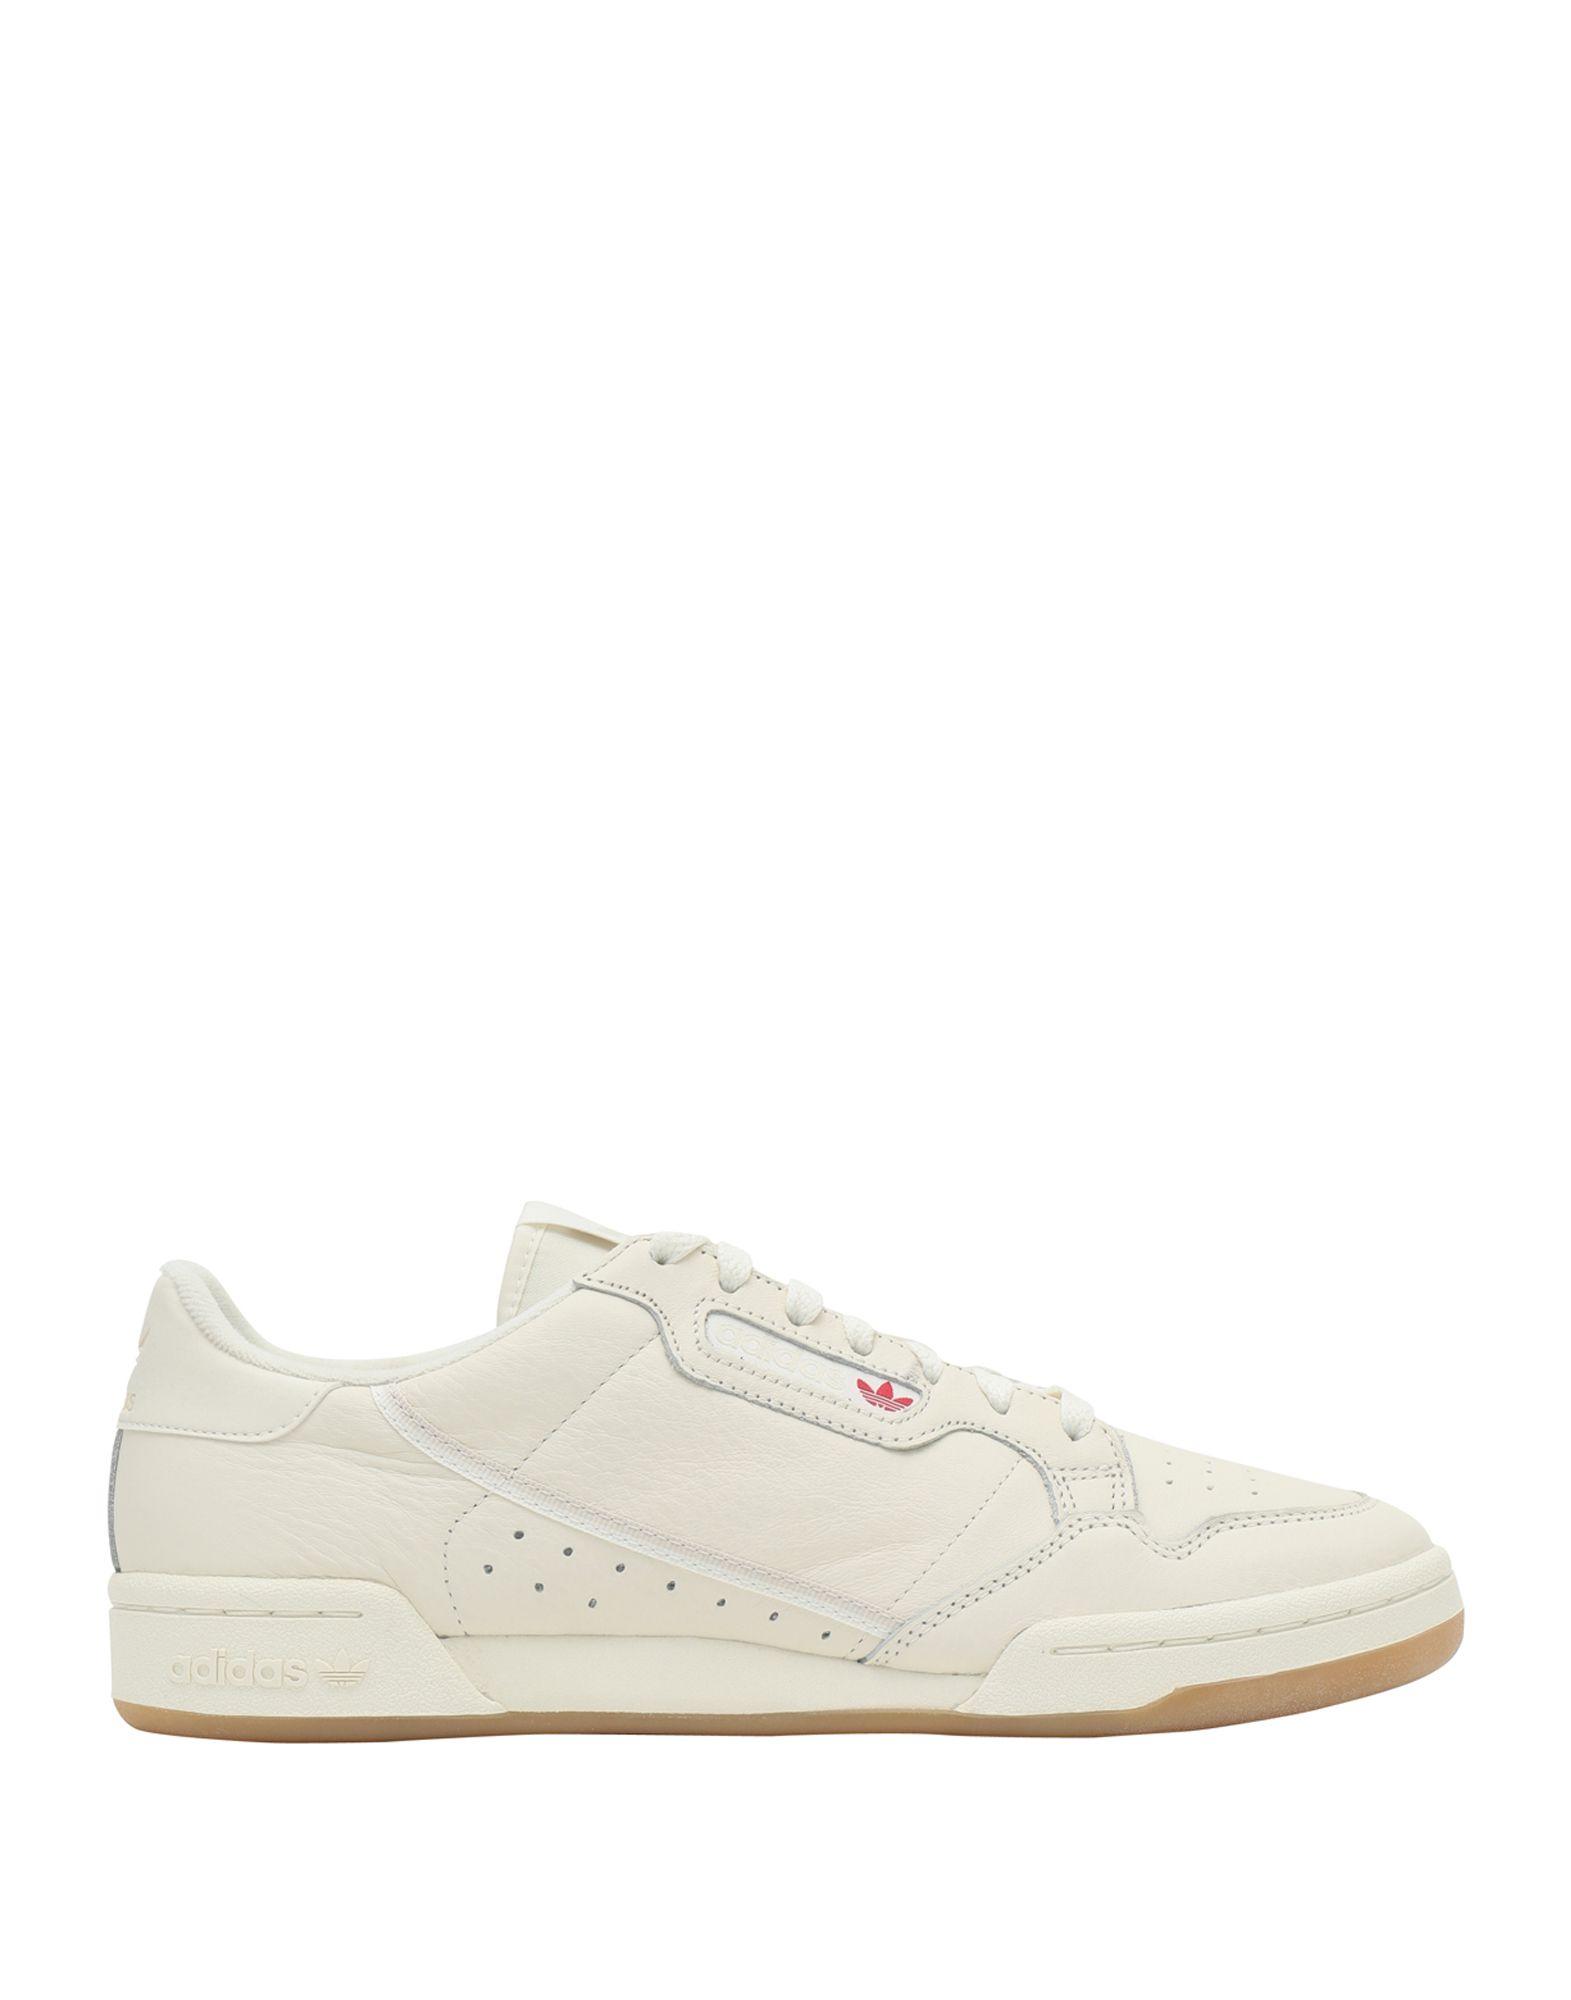 the latest f6f1a 0dc84 Sneakers Adidas Originals Continental 80 - Uomo - Acquista online su YOOX -  11644971OG